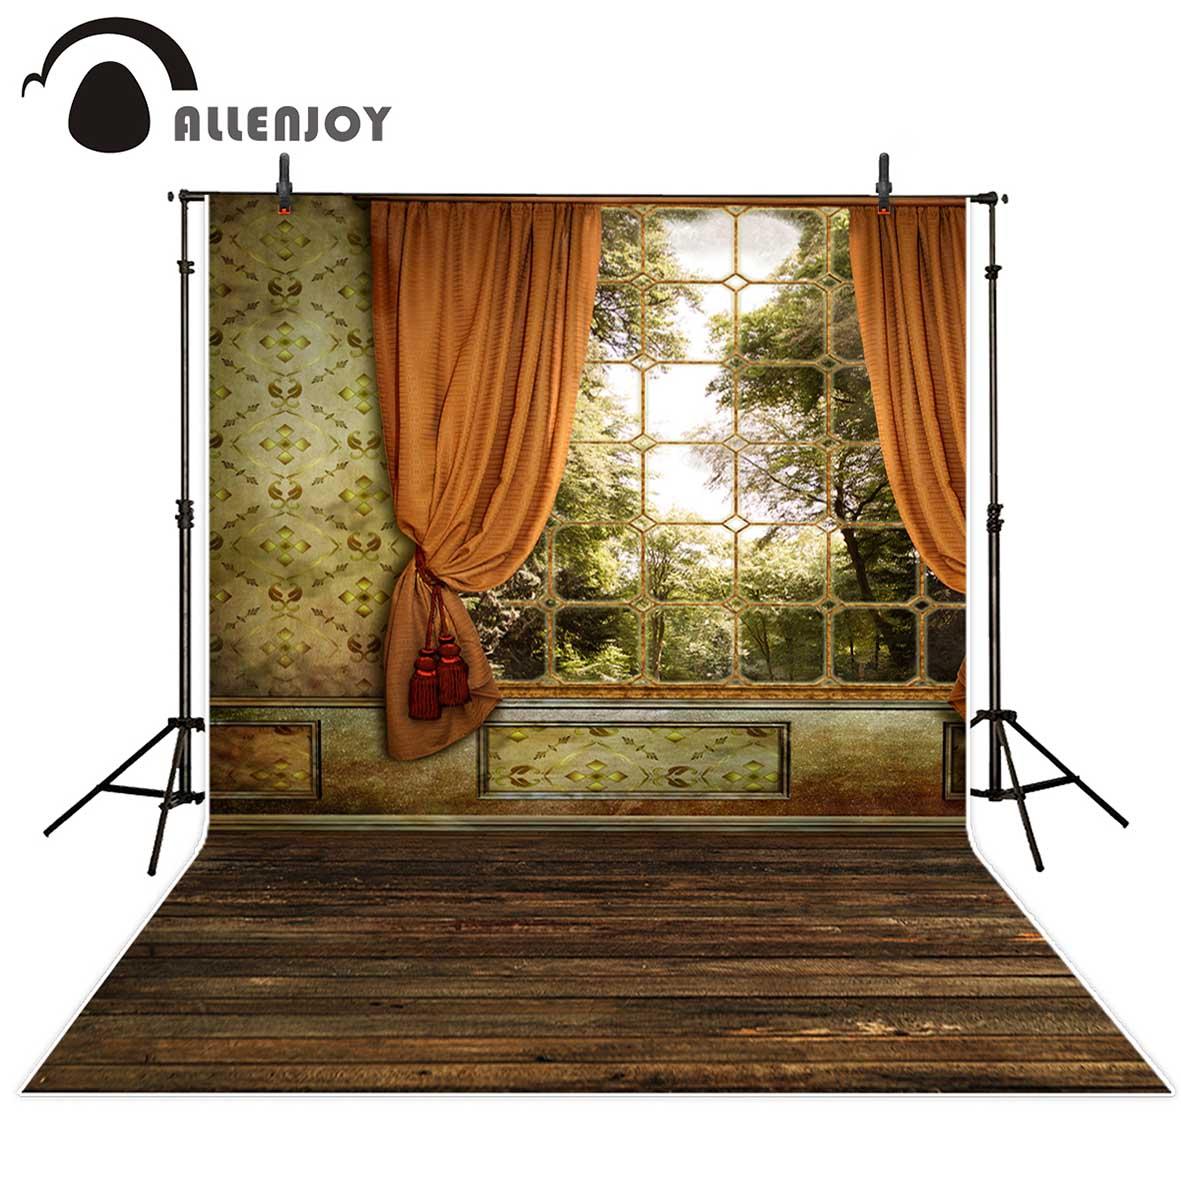 window background studio backdrop ancient landscape allenjoy photobooth photocall